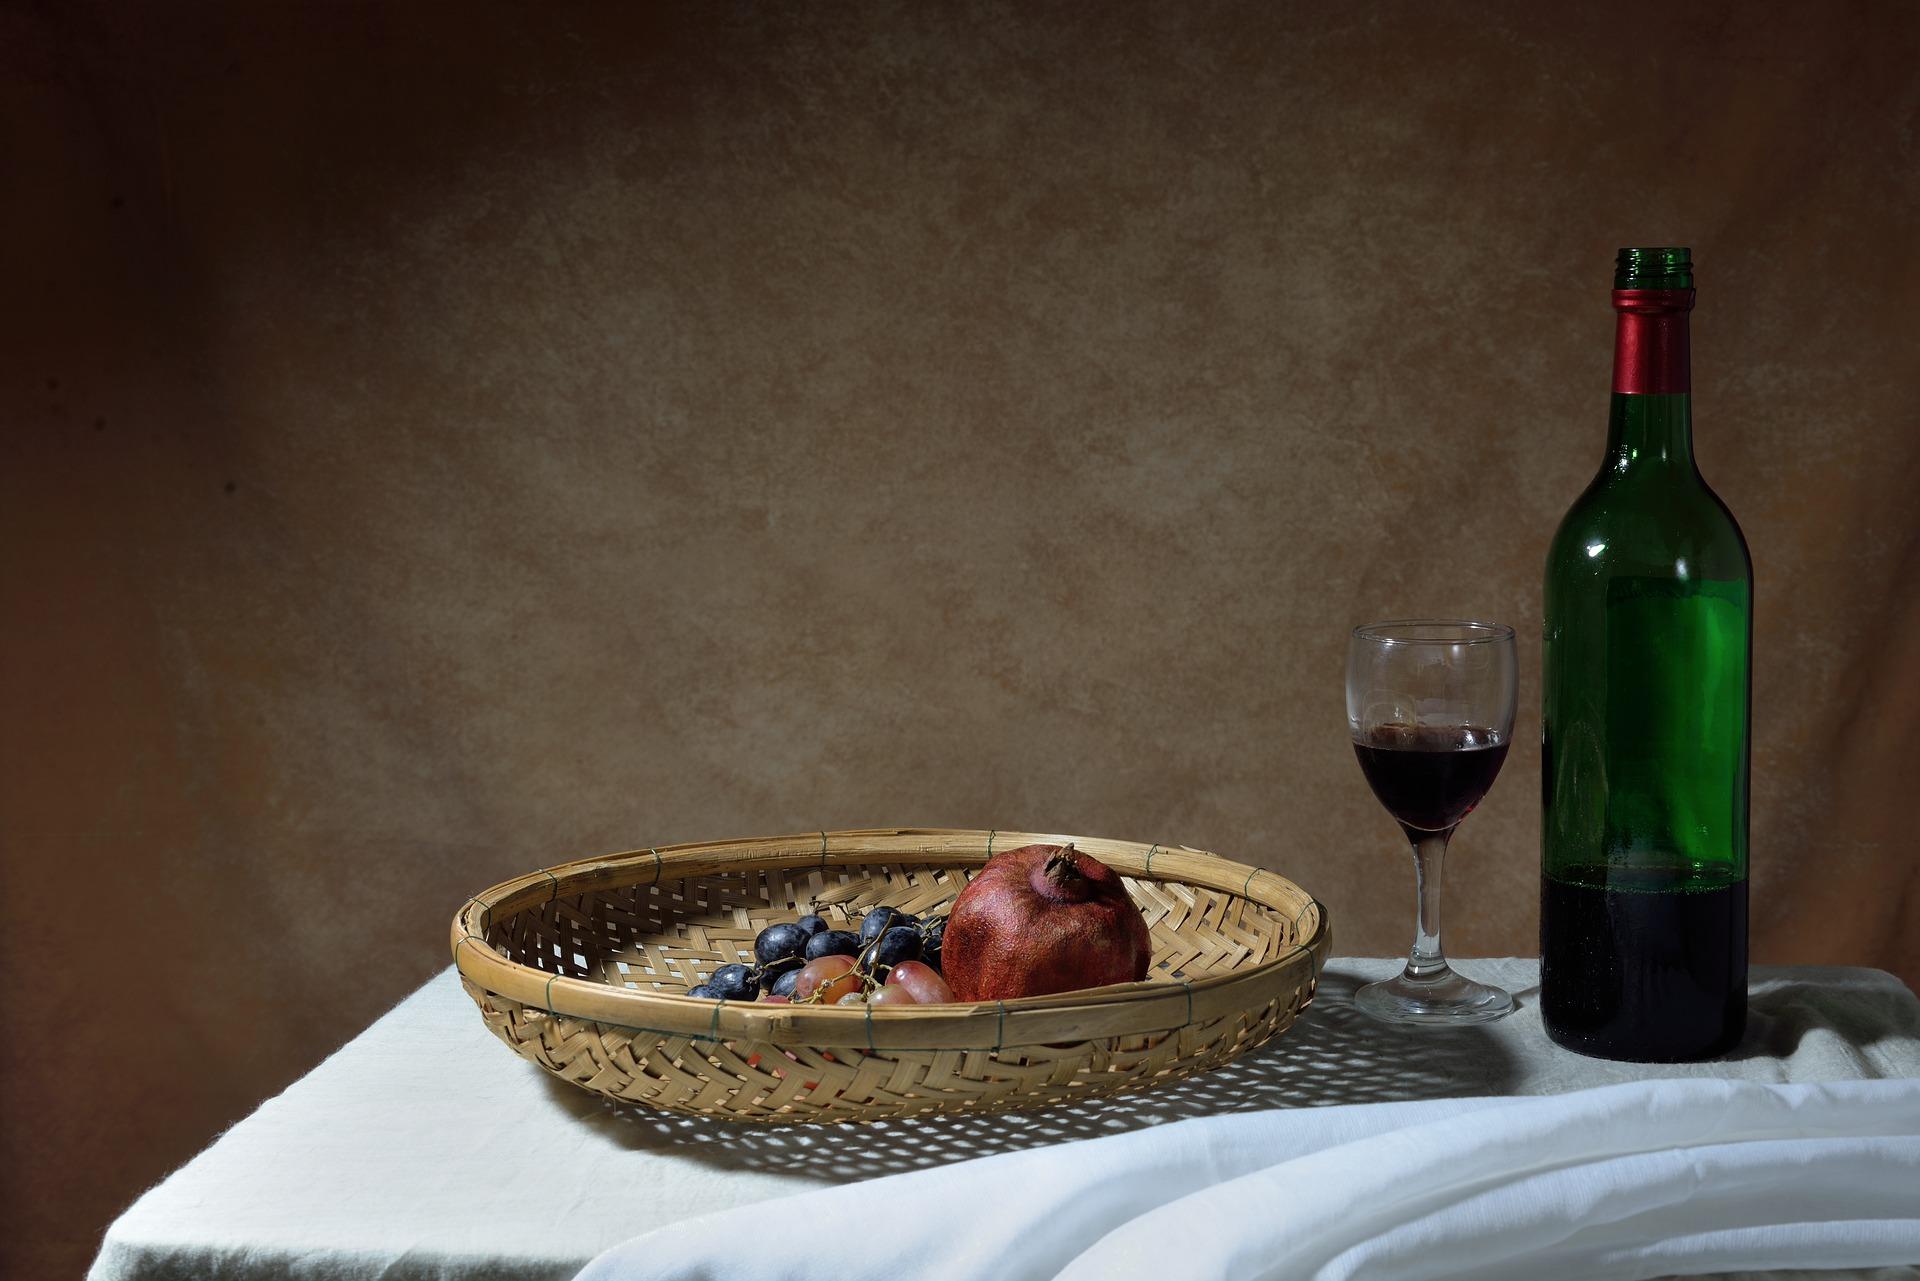 Chilean Wine in China